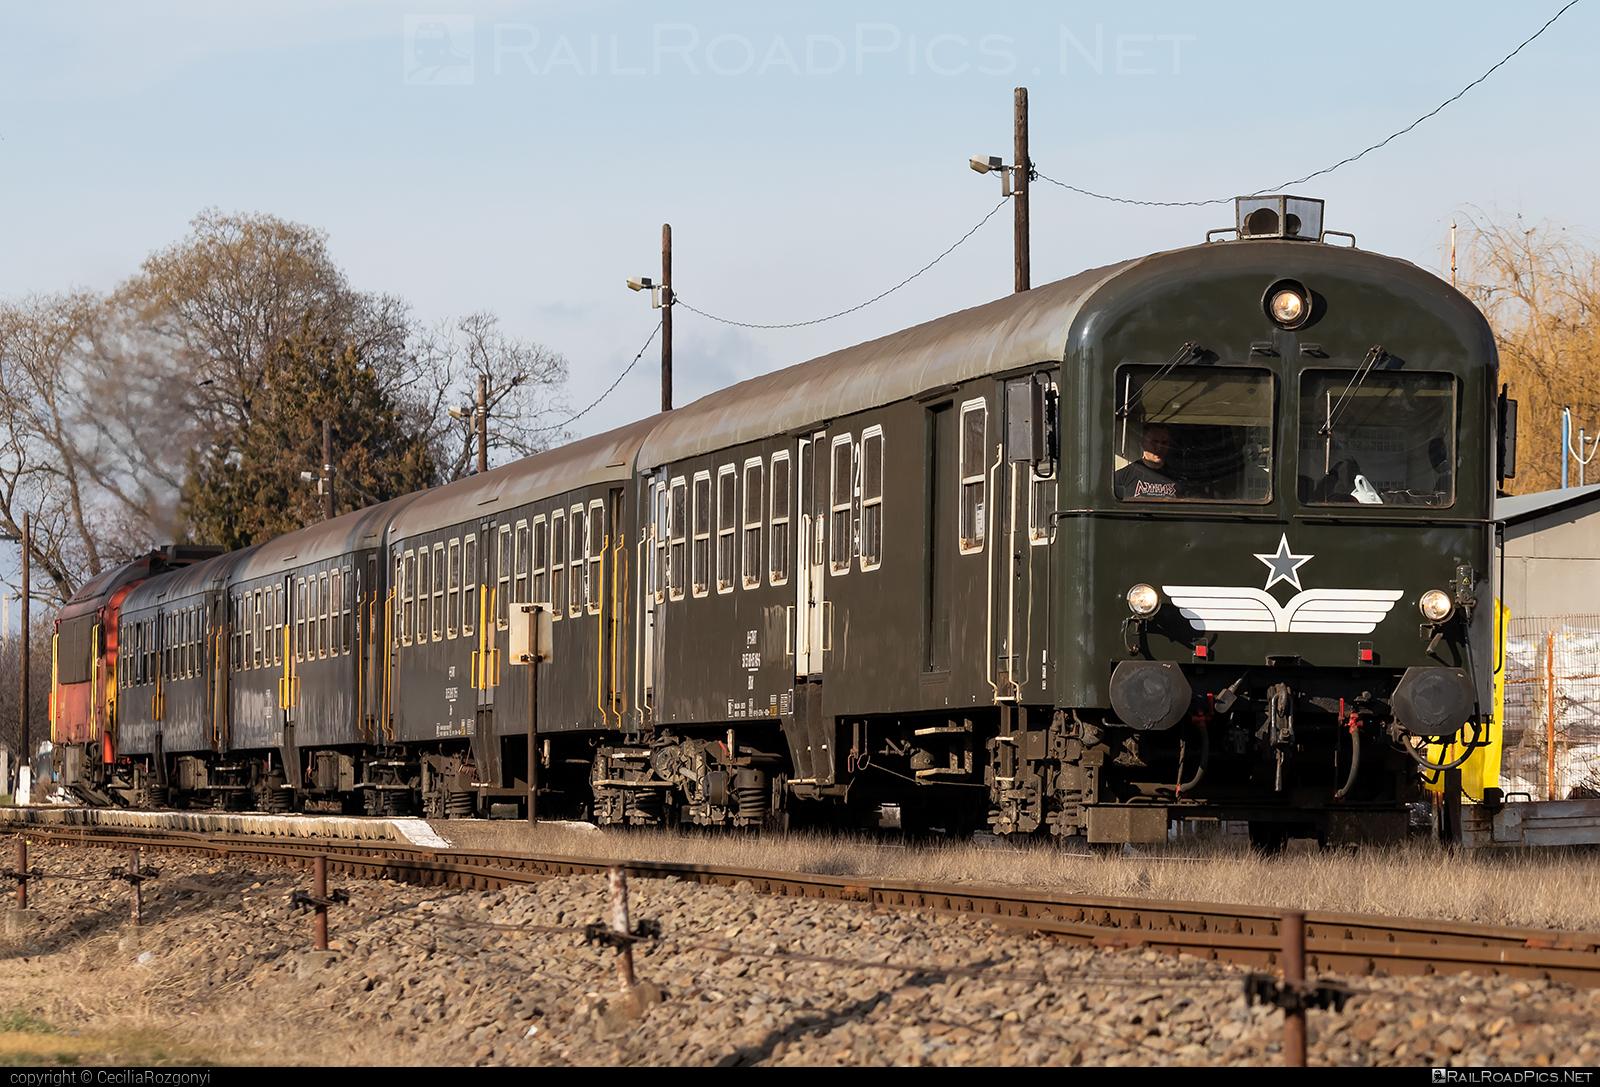 Class BD - BDt - BDt 100 Controlcar - 149 operated by MÁV-START ZRt. #bdt #mav #mavstart #mavstartzrt